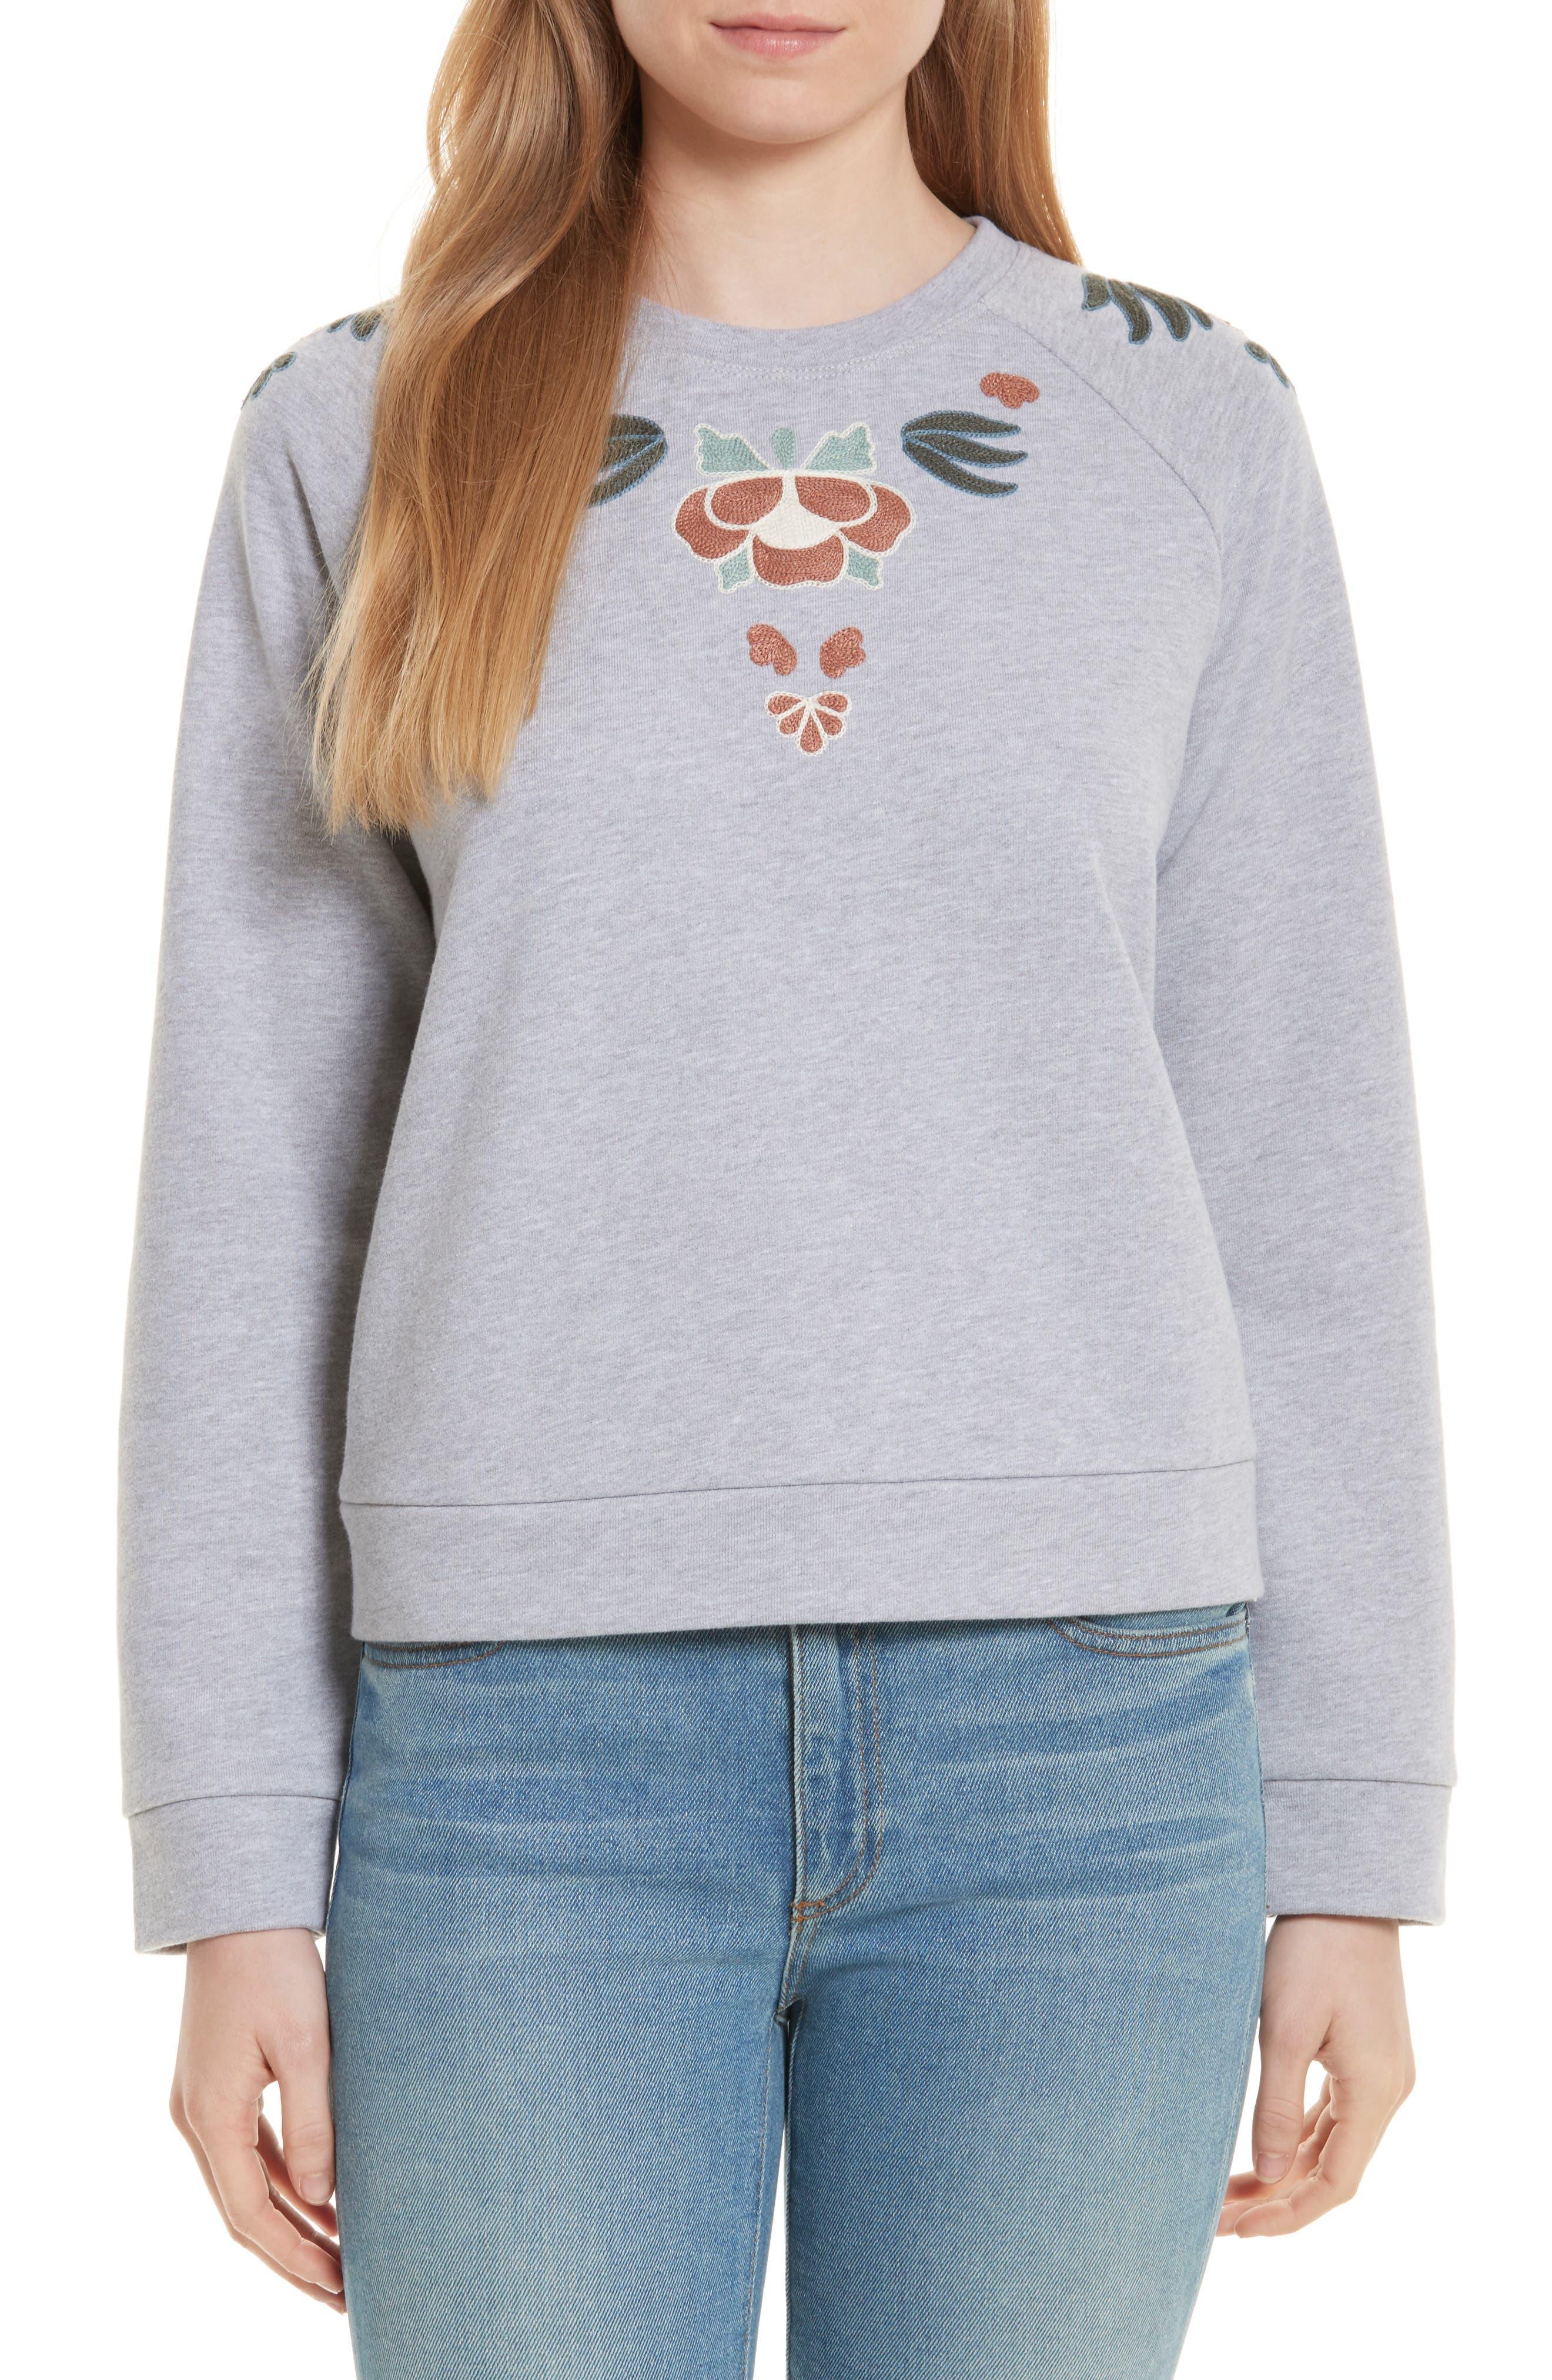 Jennings Embroidered Sweatshirt,                         Main,                         color, Heather Grey